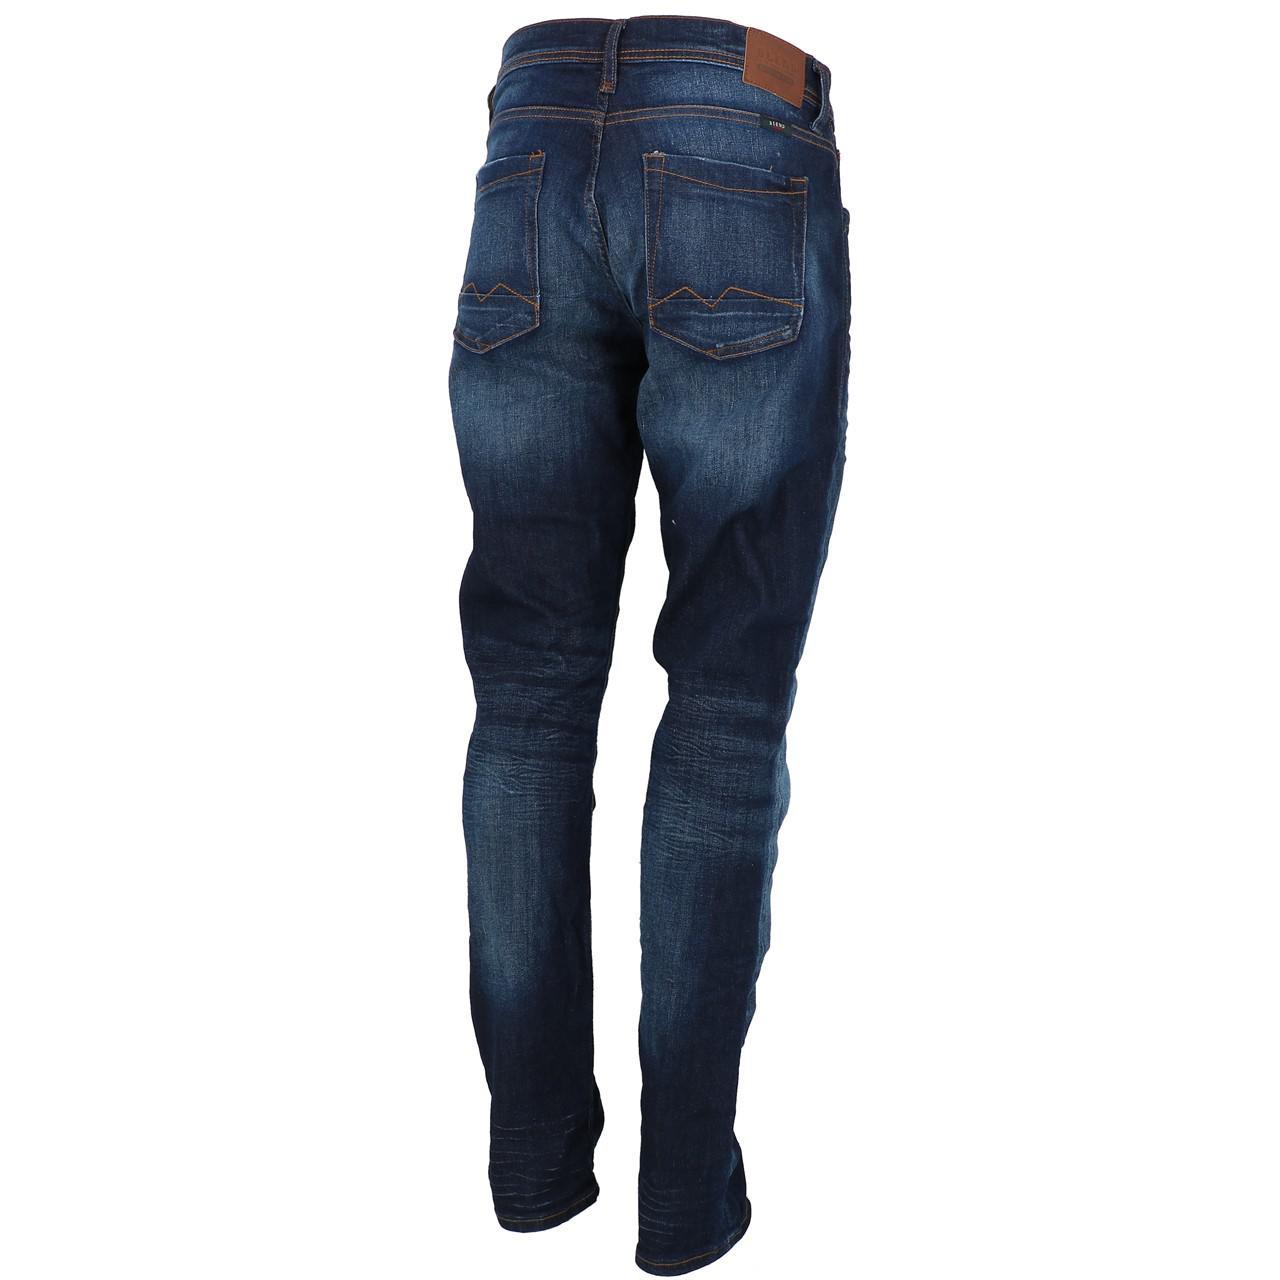 Jeans-Pants-Slim-Blend-Twister-34-Denim-Dark-Reg-Blue-25943-New thumbnail 5